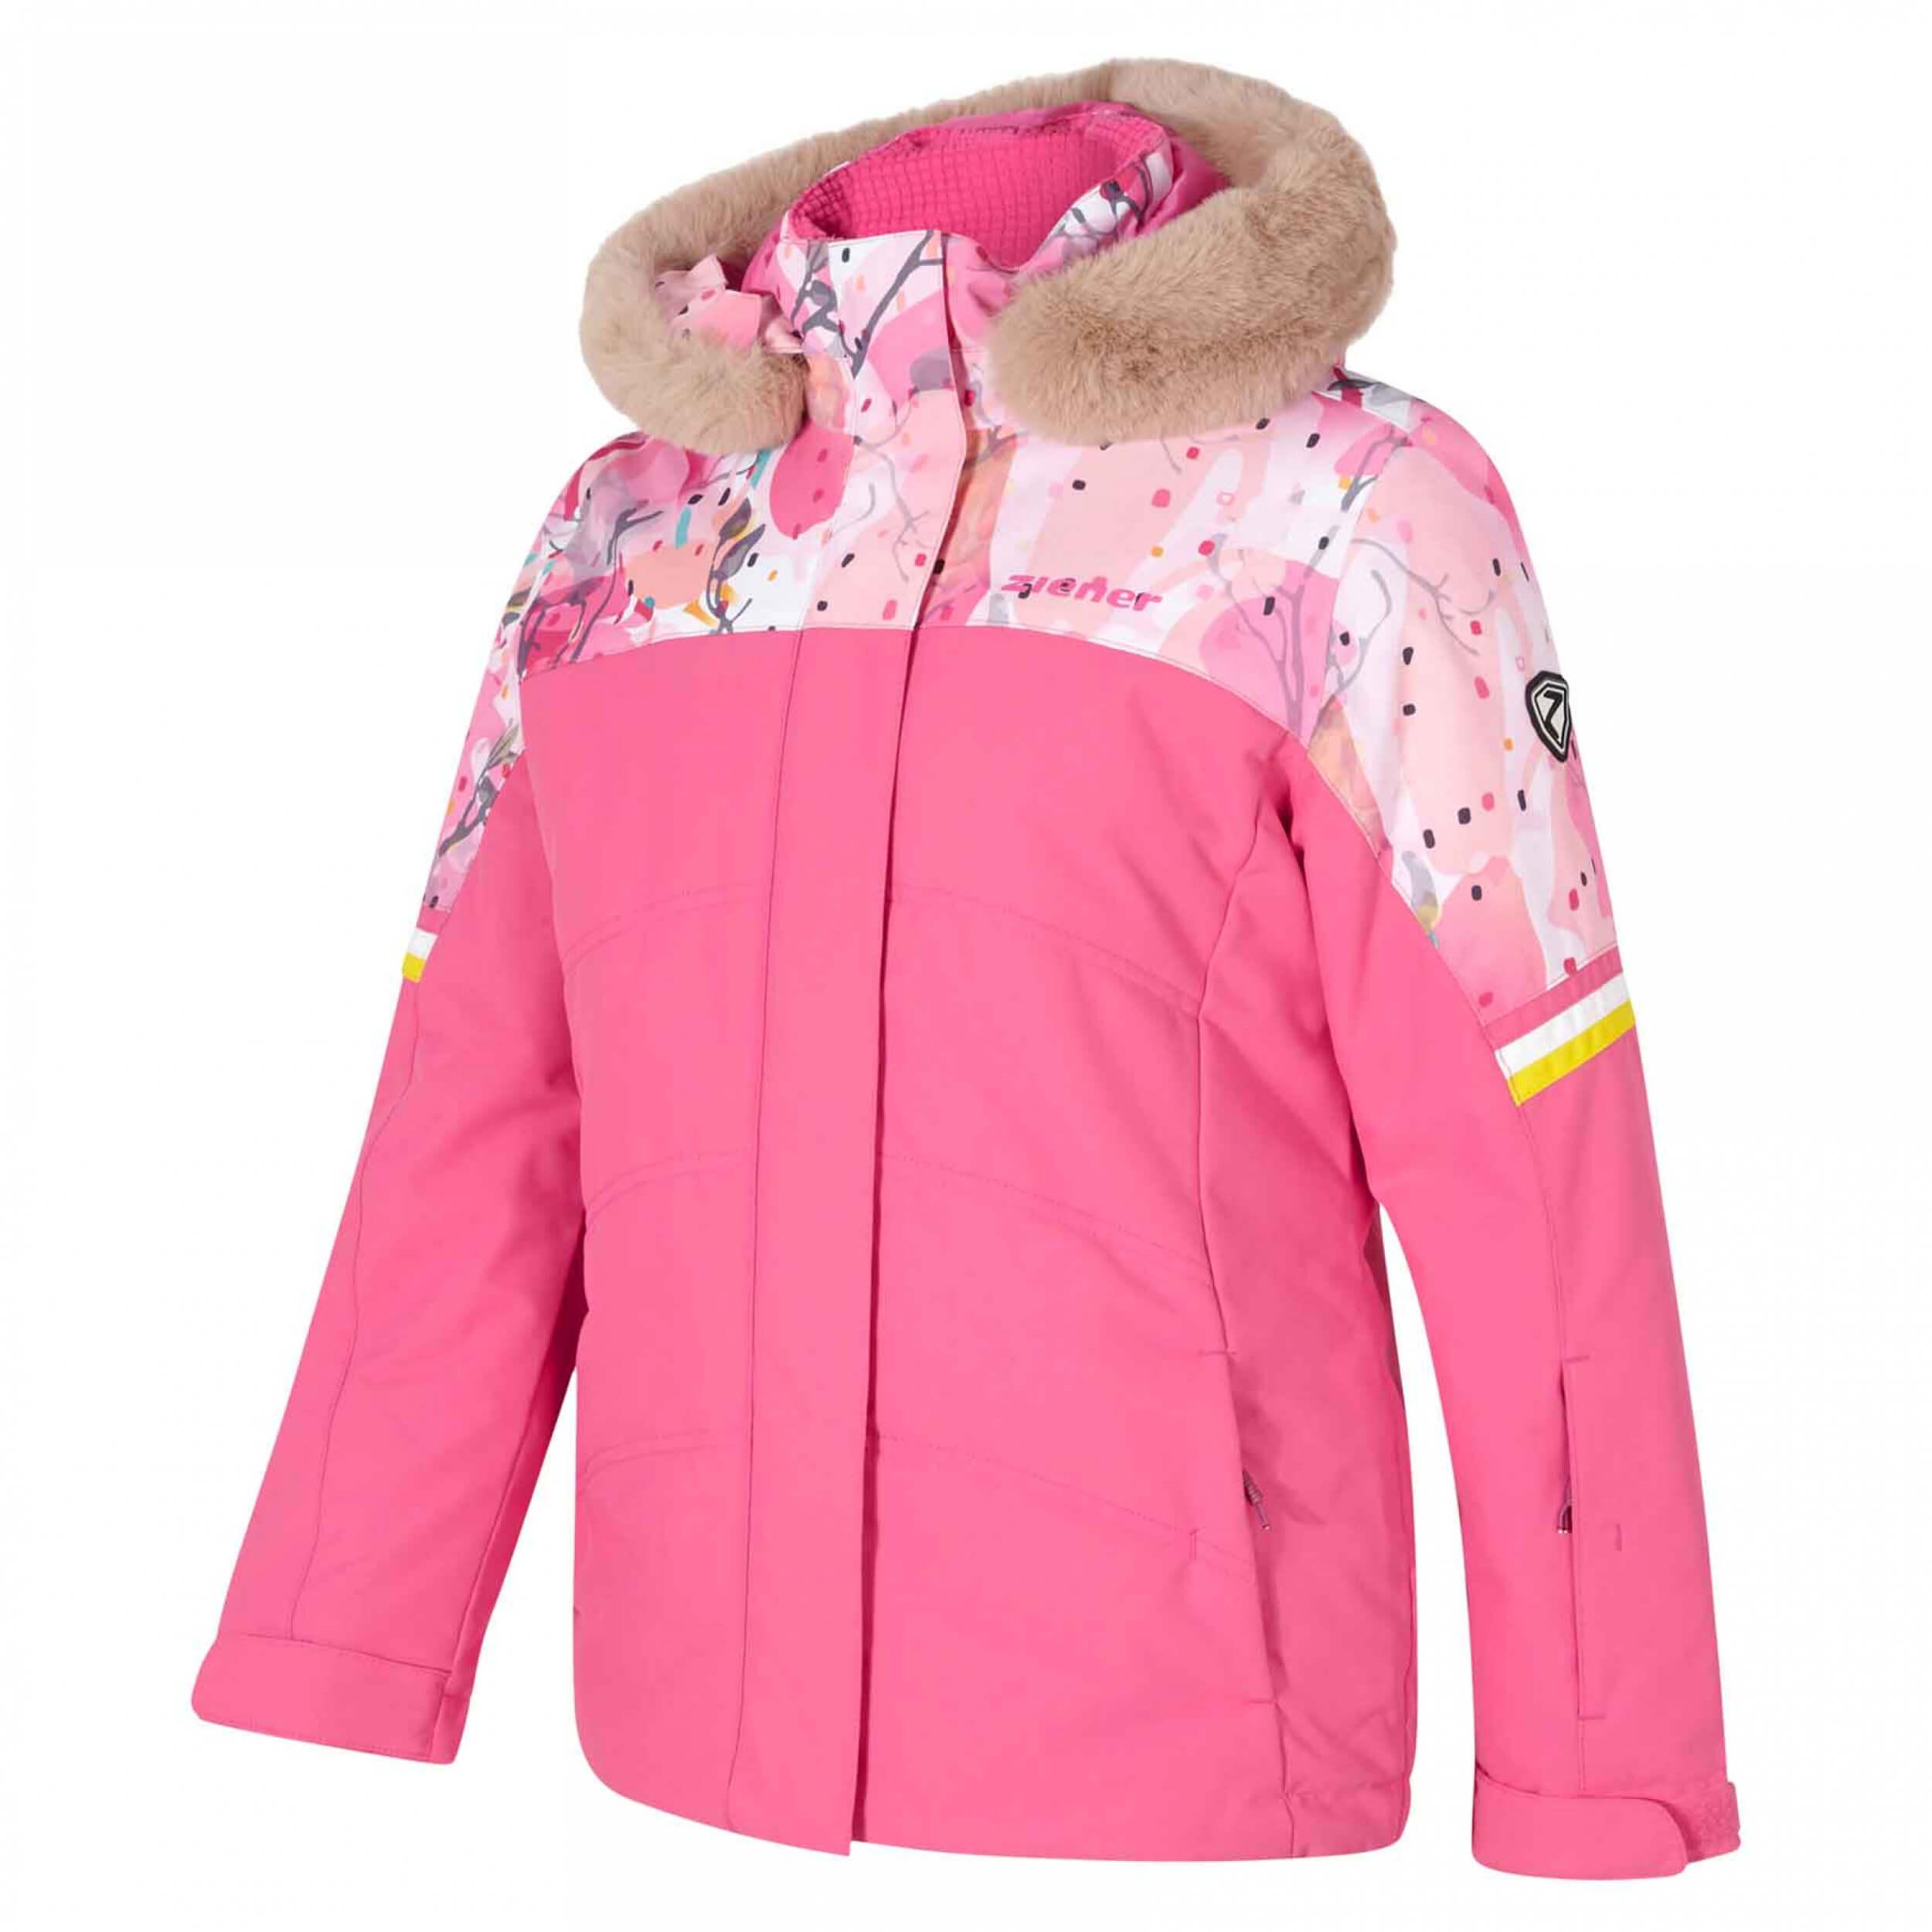 ZIENER Kinder Skijacke Athilda AQUASHIELD pink 256